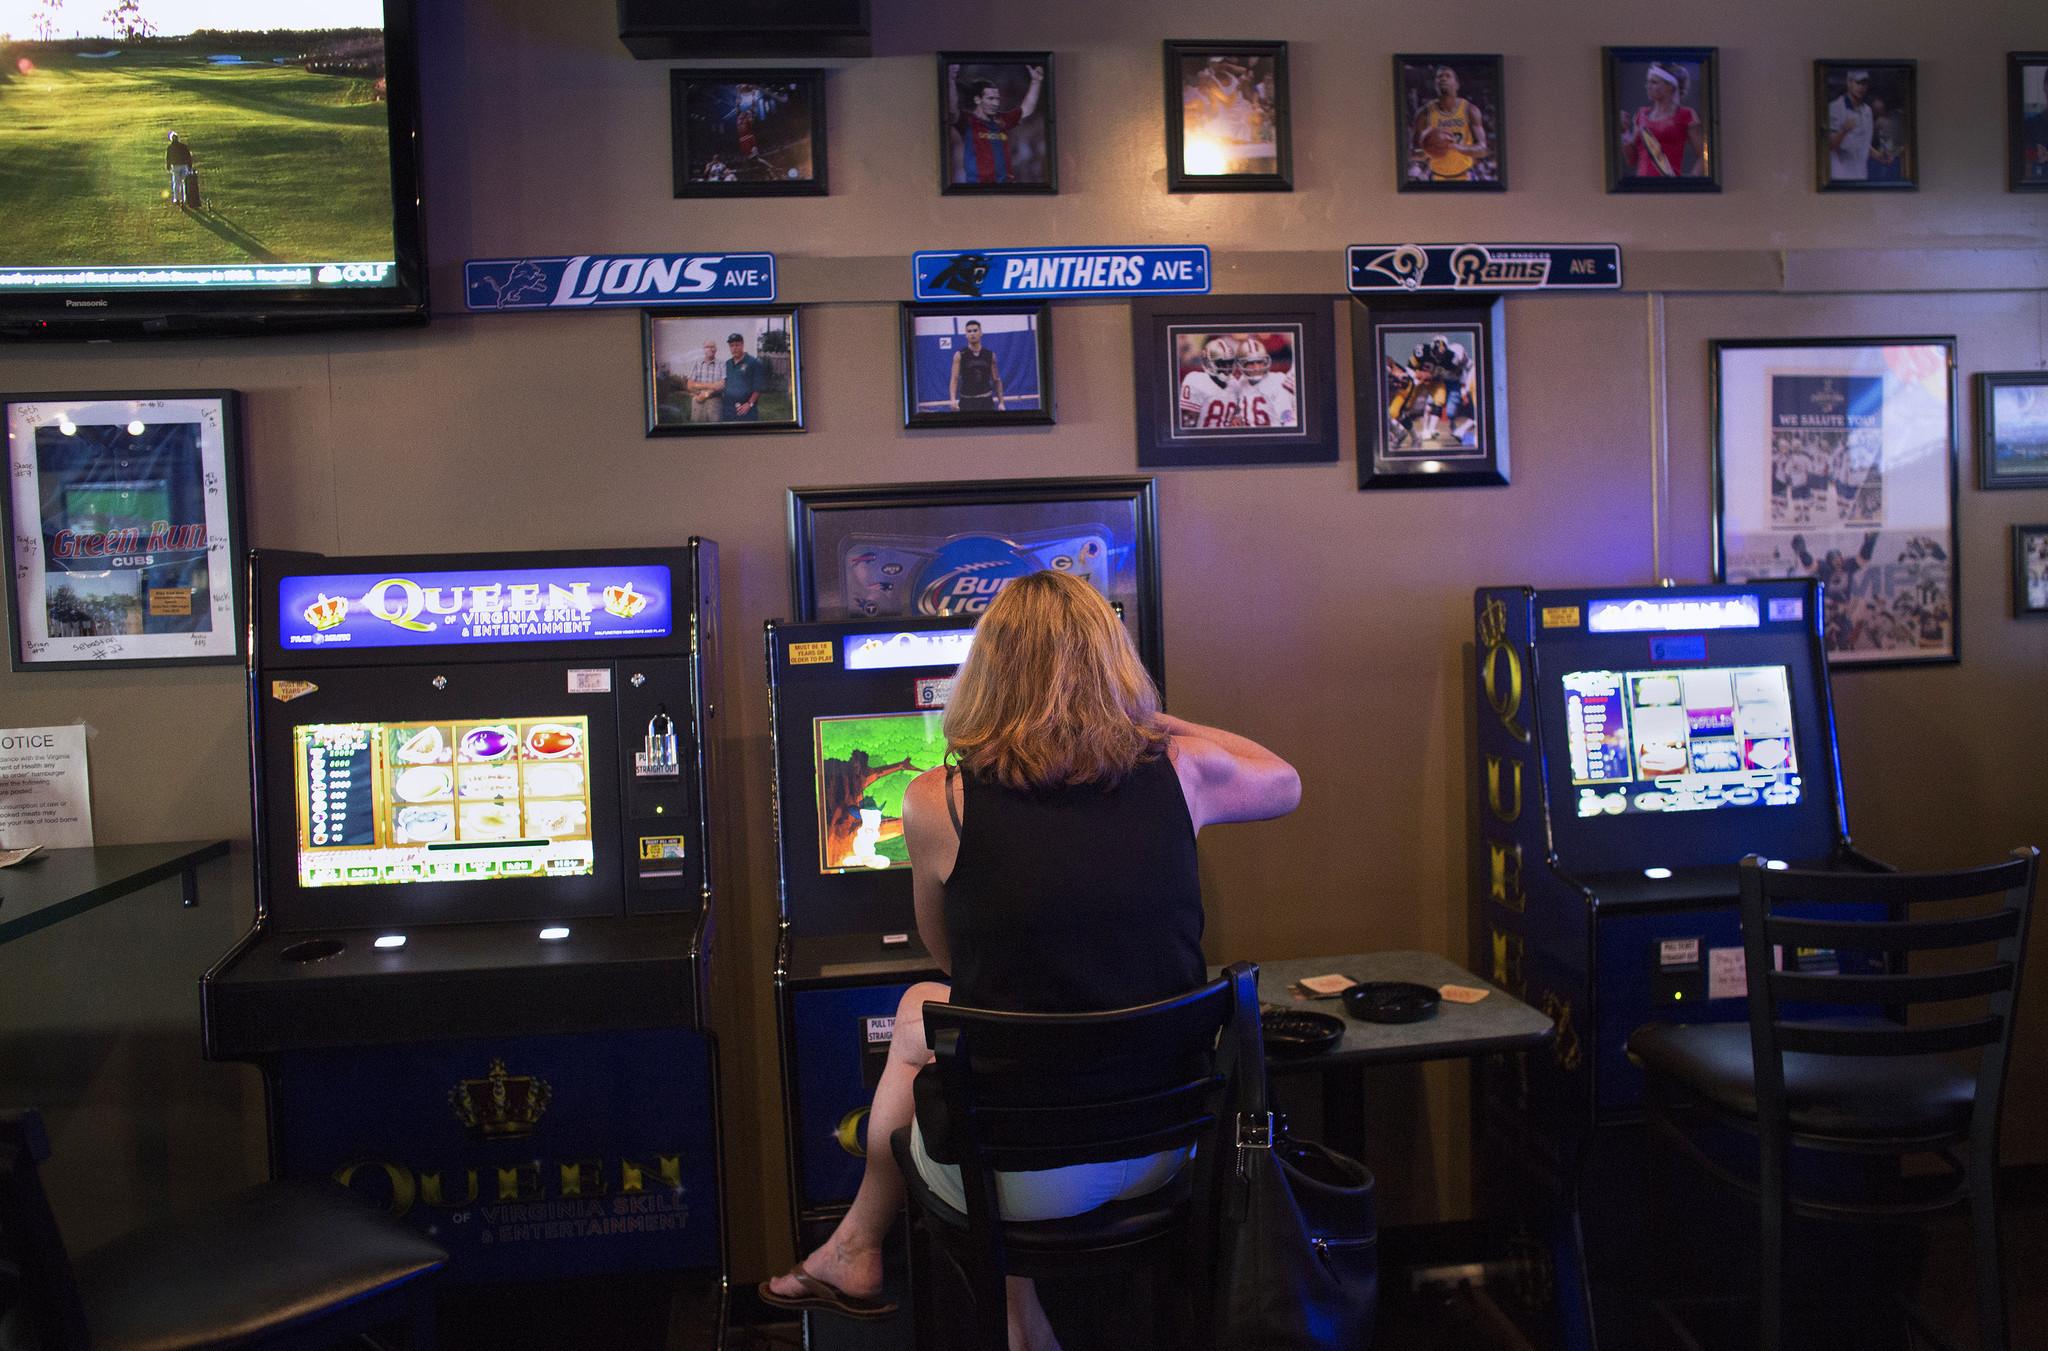 New games let bar patrons cash in, but aren't considered gambling machines  - The Virginian-Pilot - The Virginian-Pilot